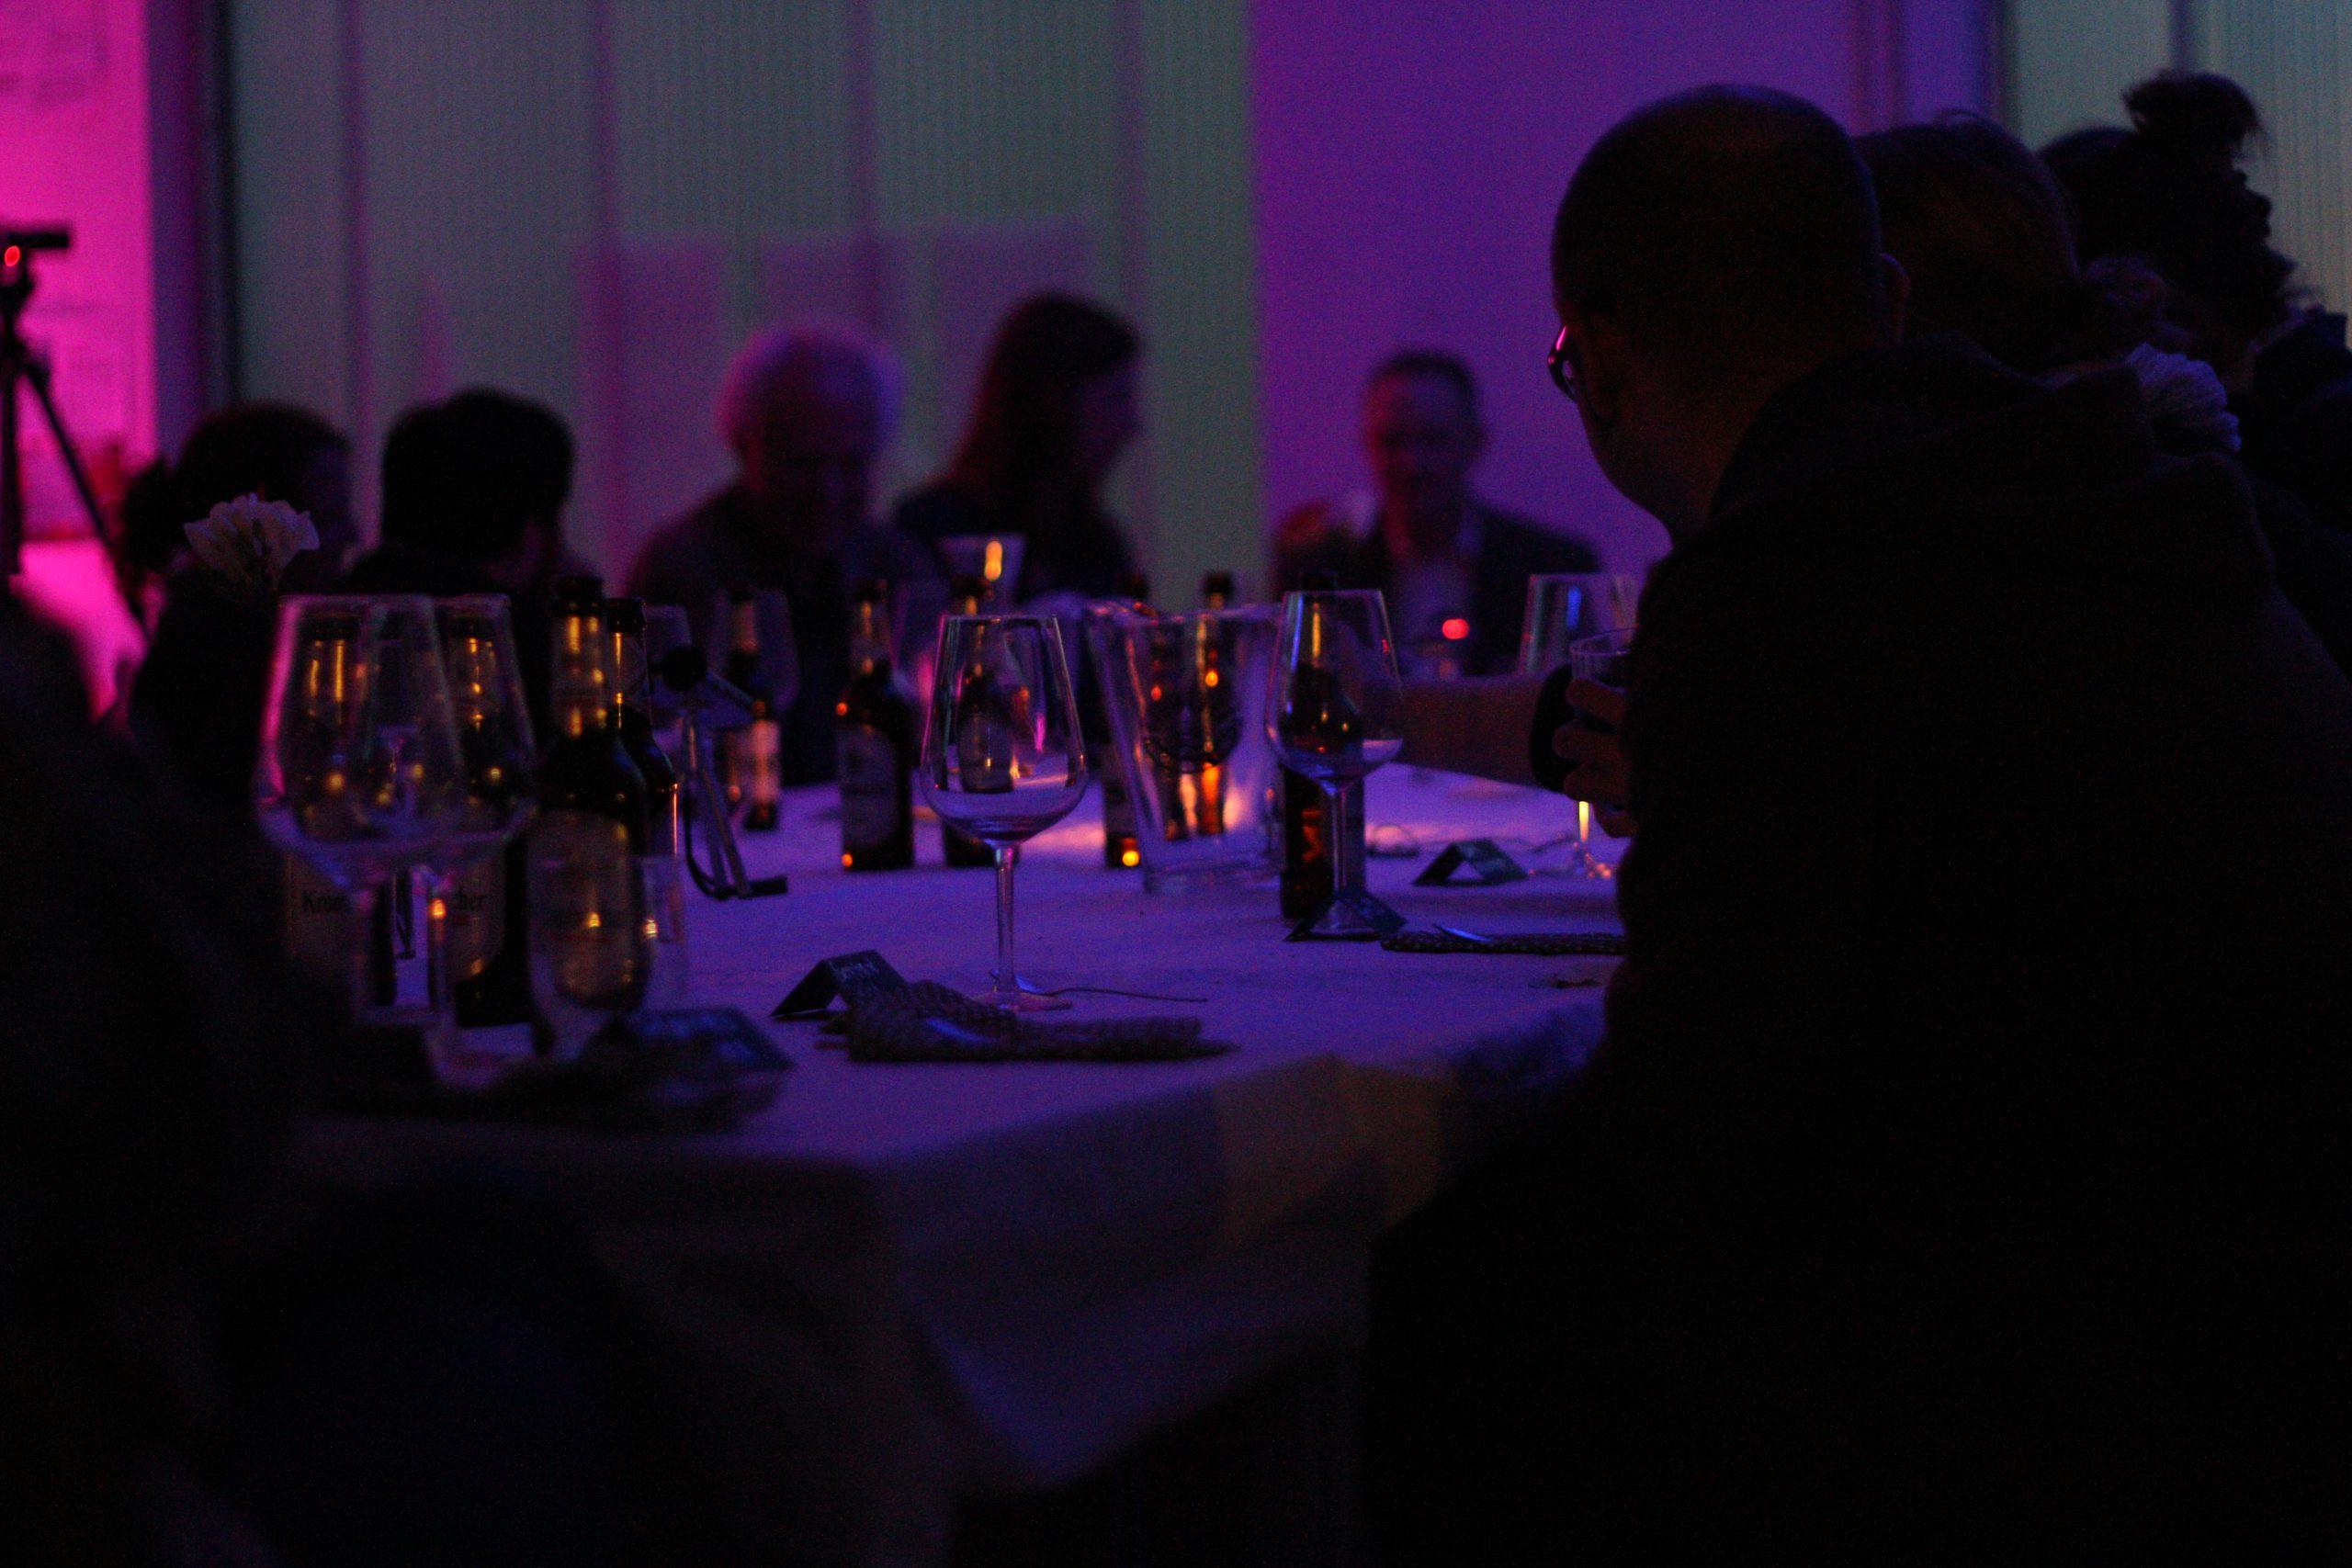 Inga Reimers, Tactfulness: An Experimental Evening on the Non-visual, 2013, Hamburg